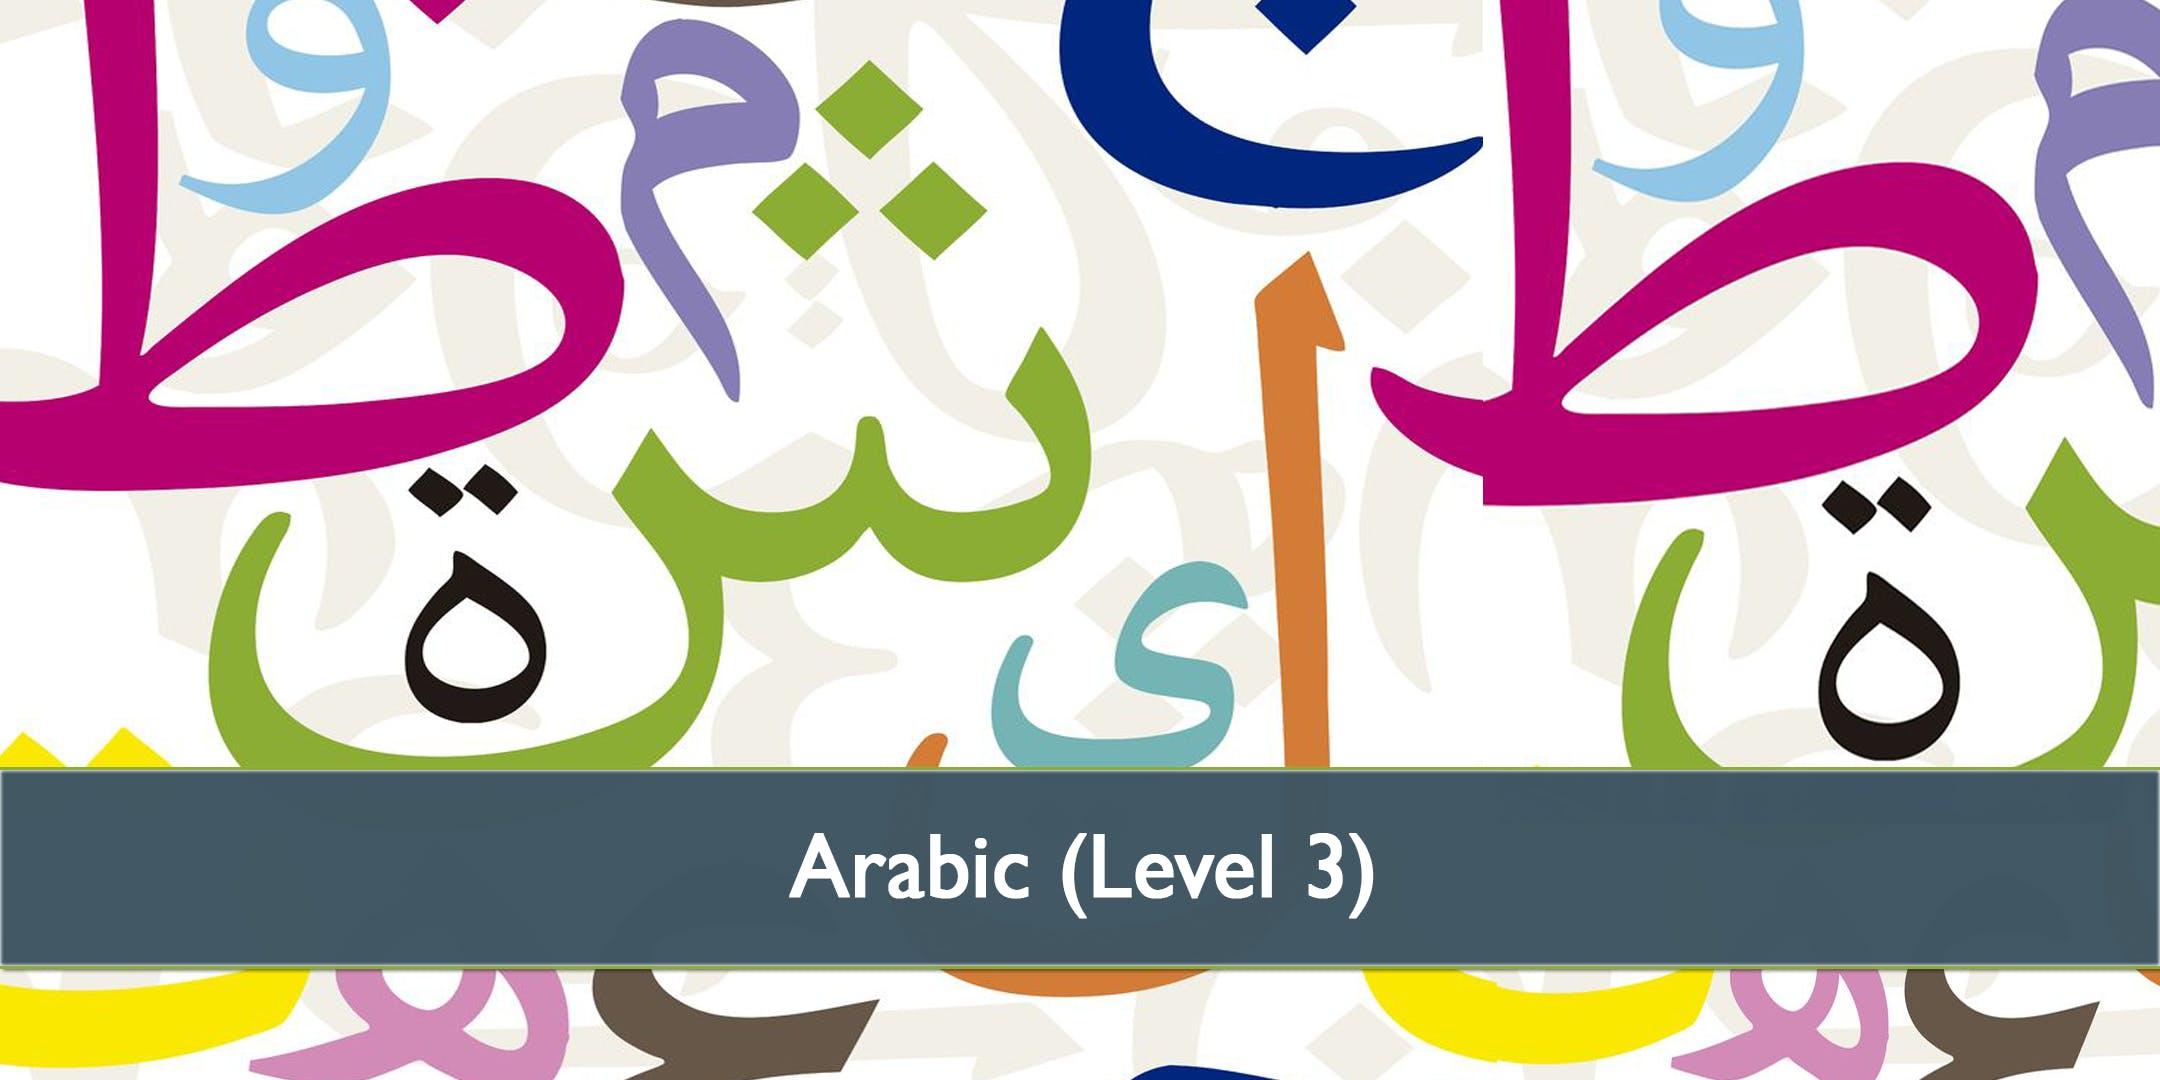 Arabic (Level 3) - January 2019